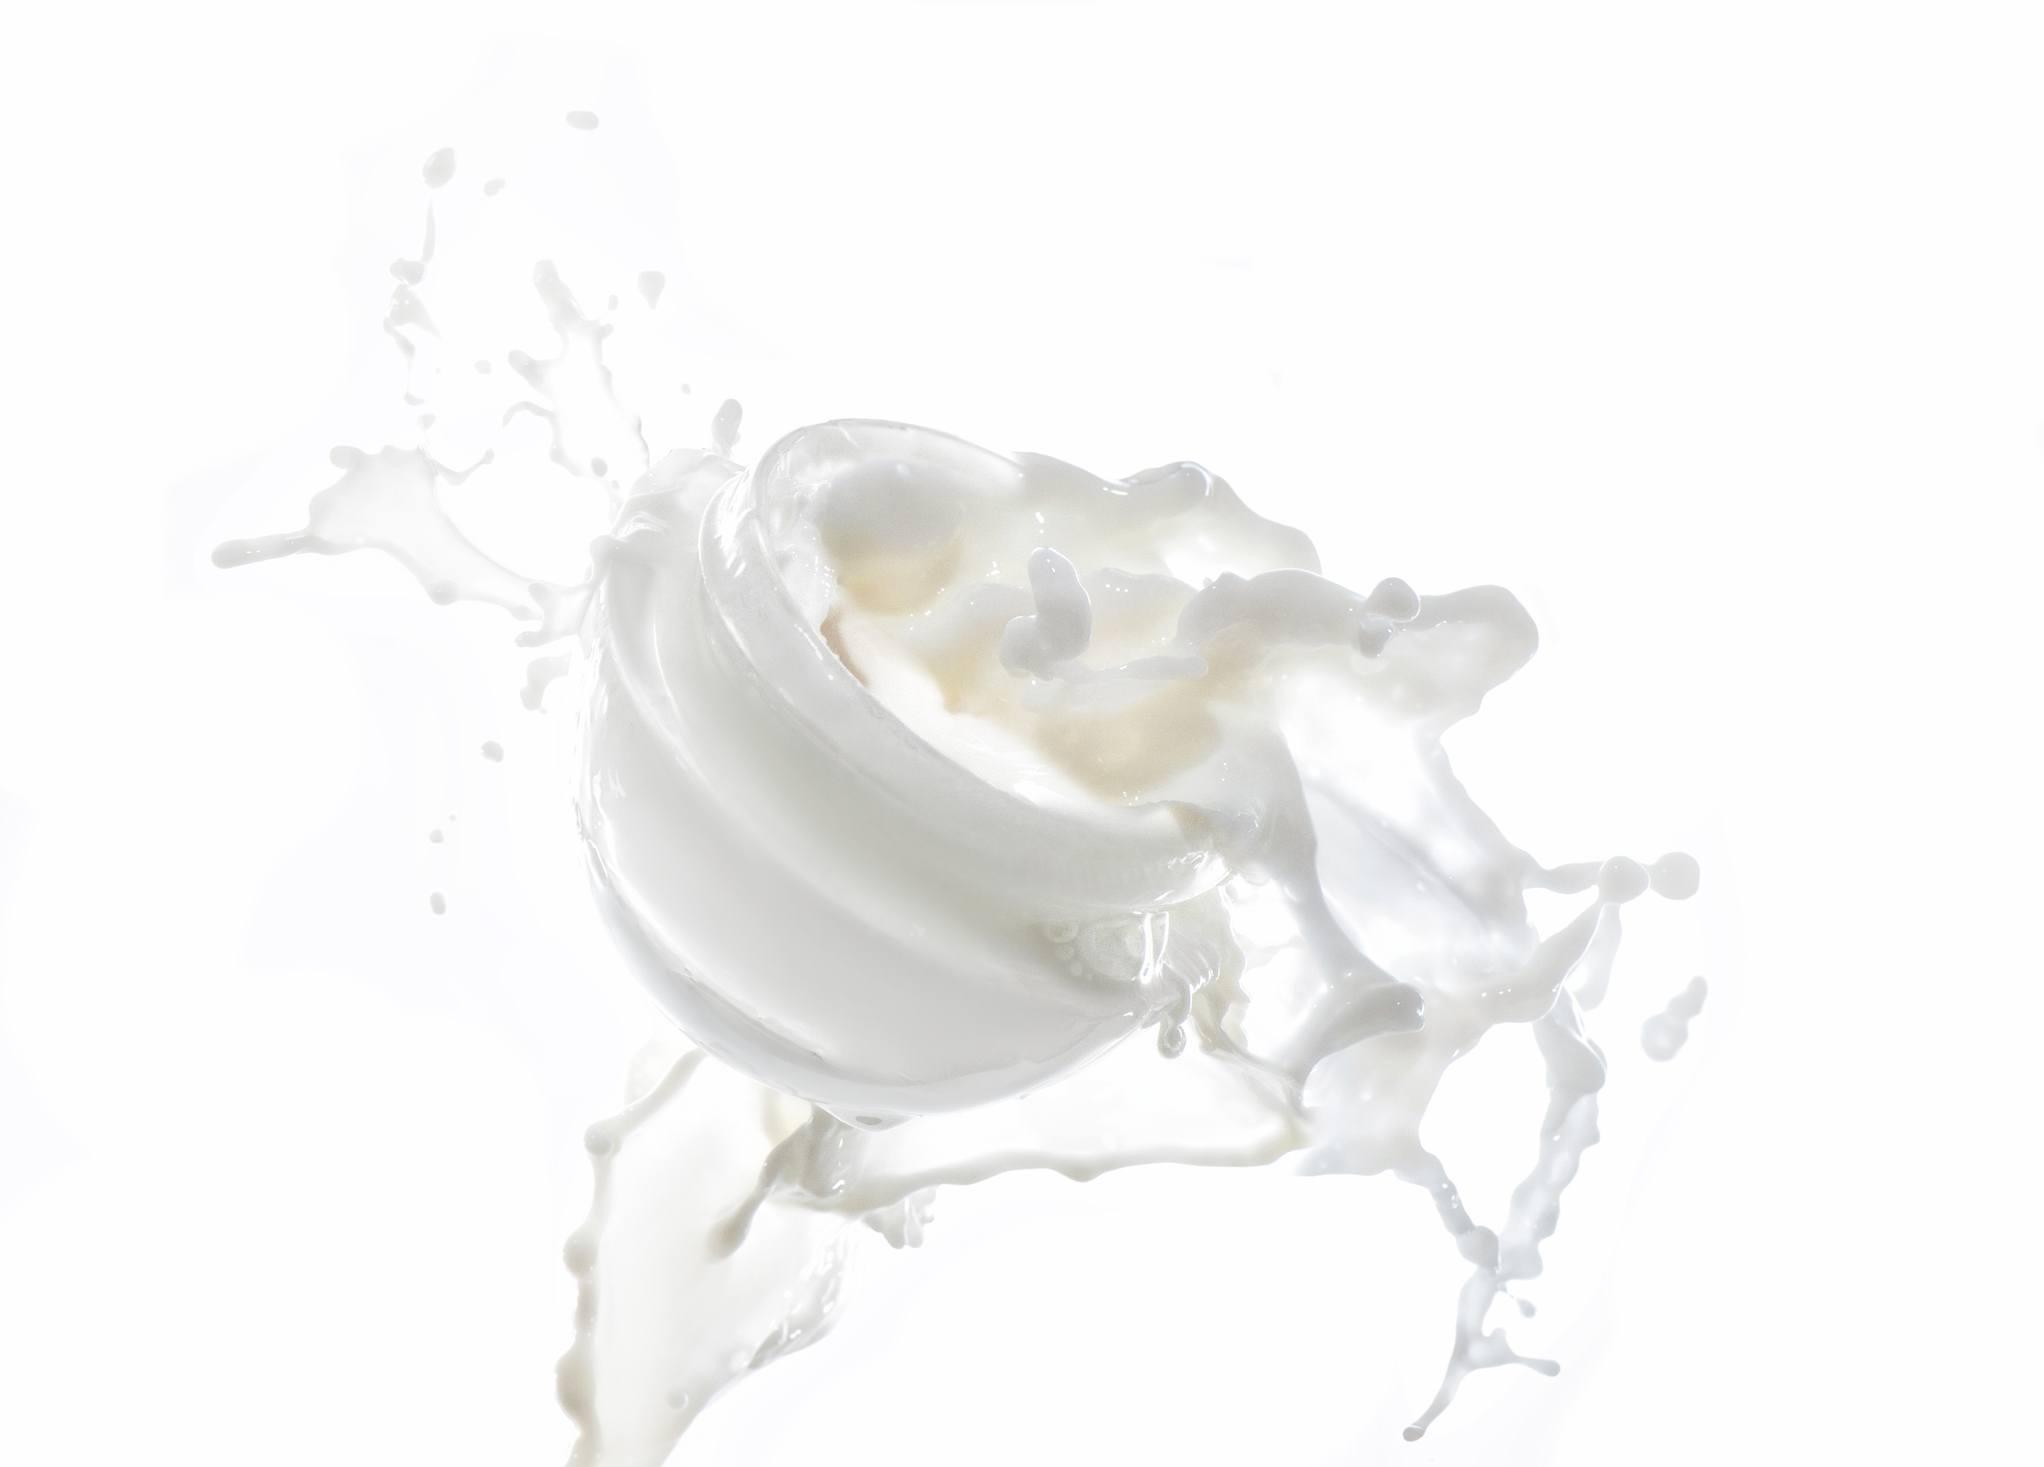 moisturizing milk in the big milk splash